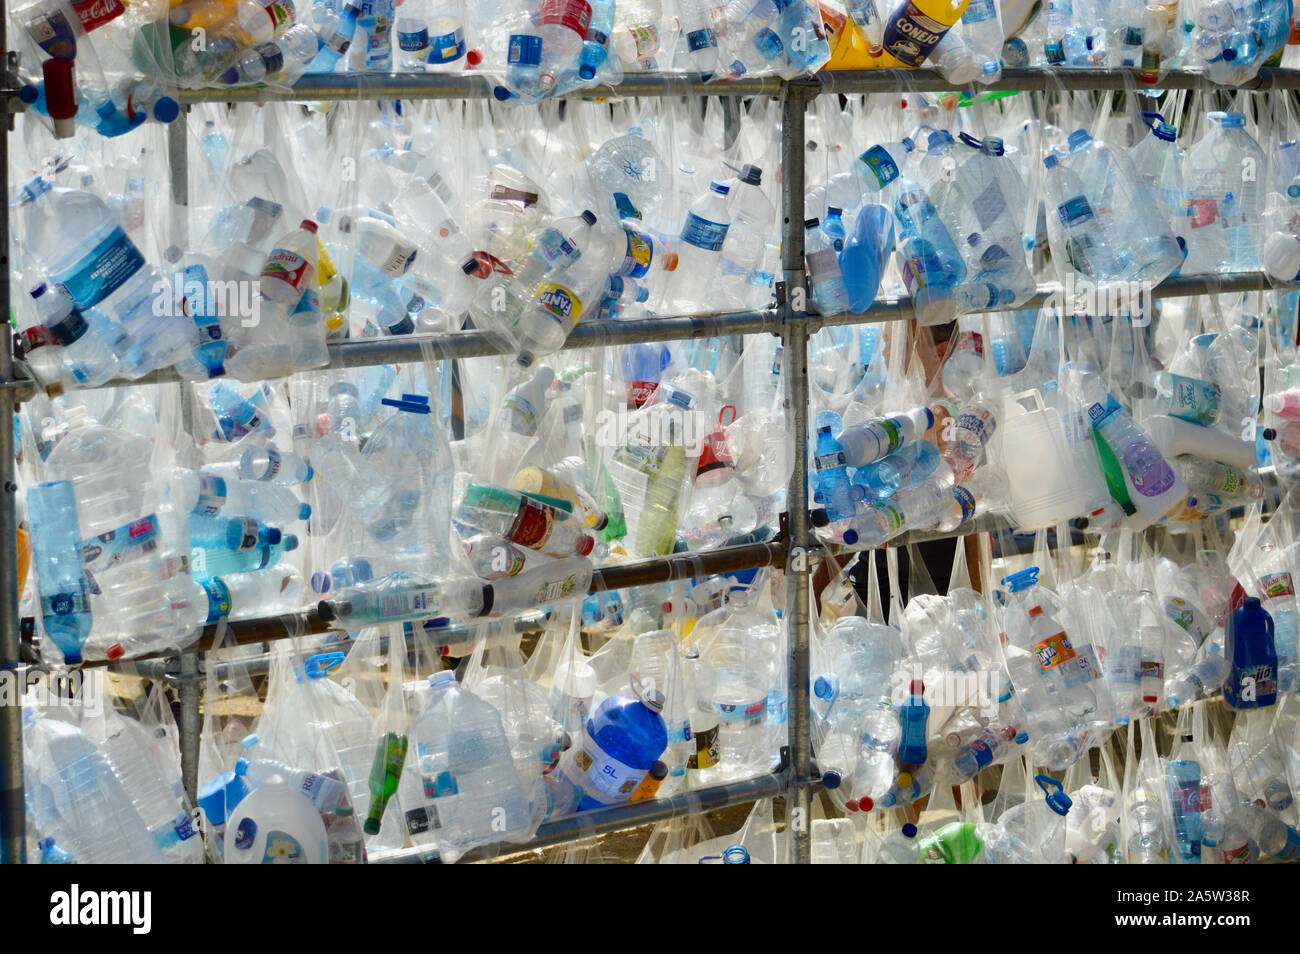 A plastic bottle art exhibition at Ciutadella Park during La Merce 2019 in Barcelona, Spain Stock Photo